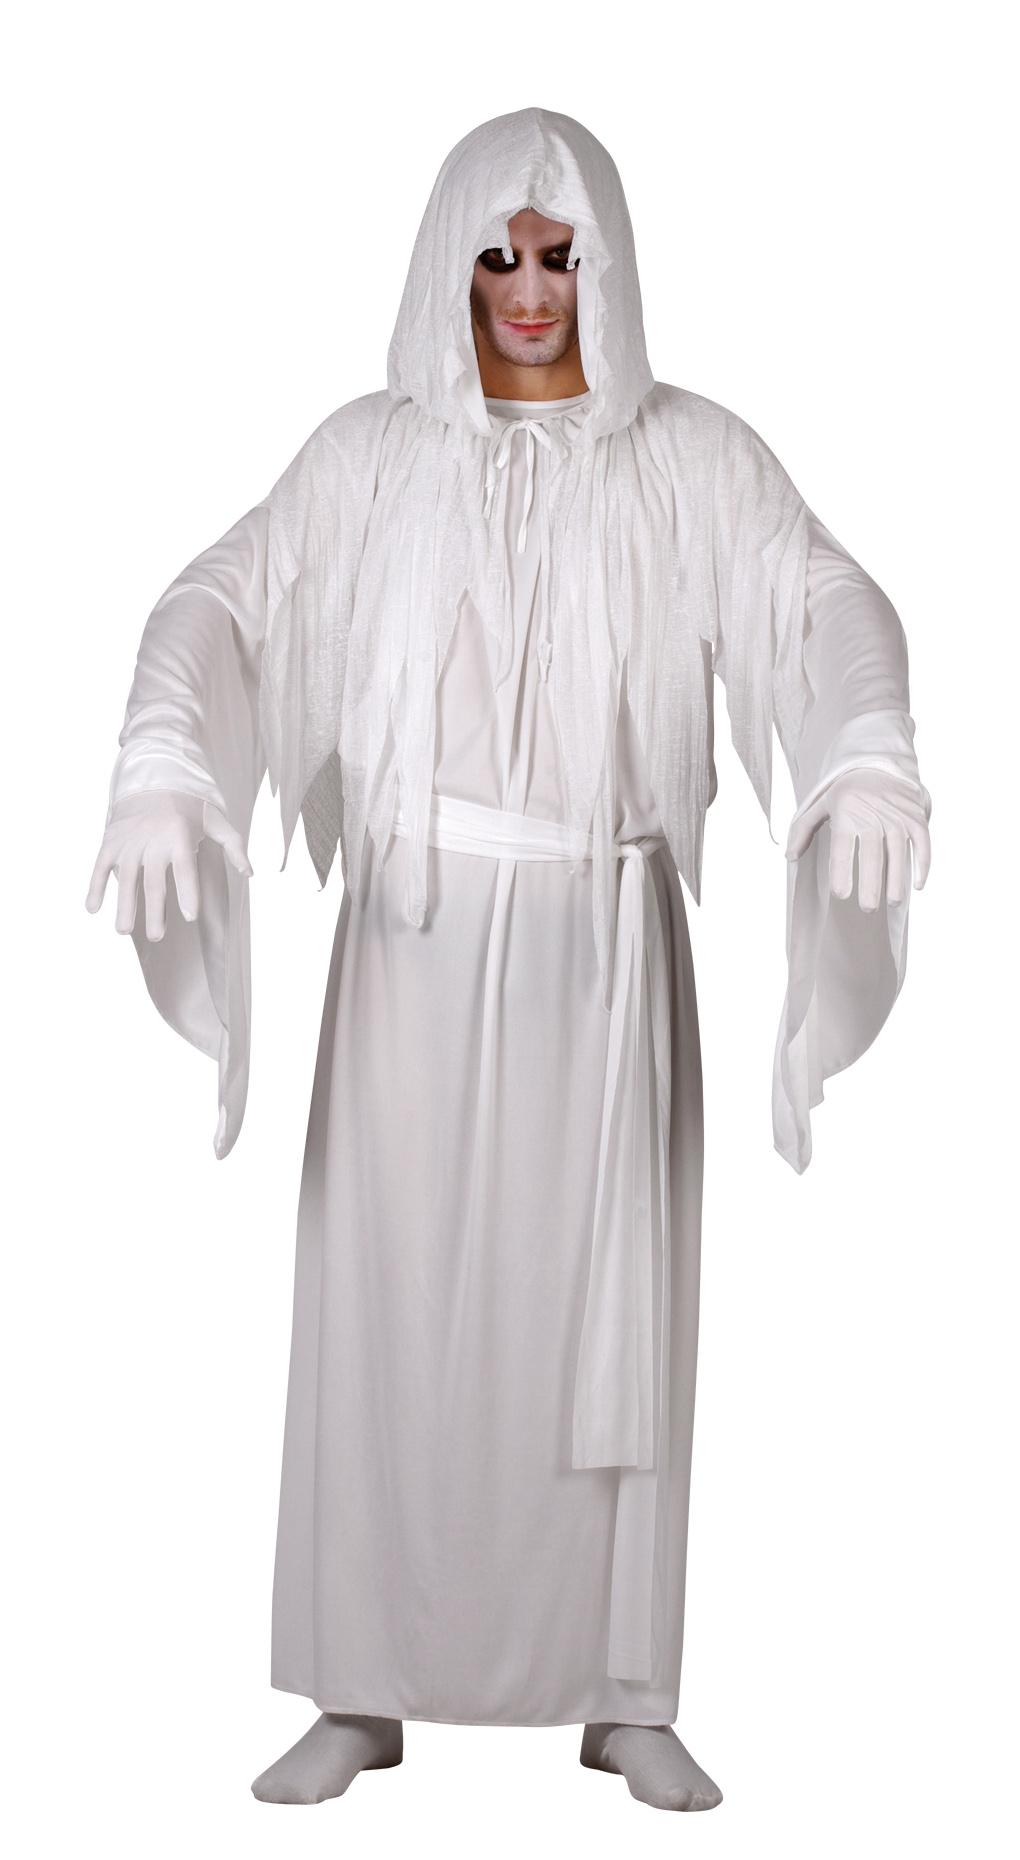 d guisement fant me halloween costume adulte homme. Black Bedroom Furniture Sets. Home Design Ideas